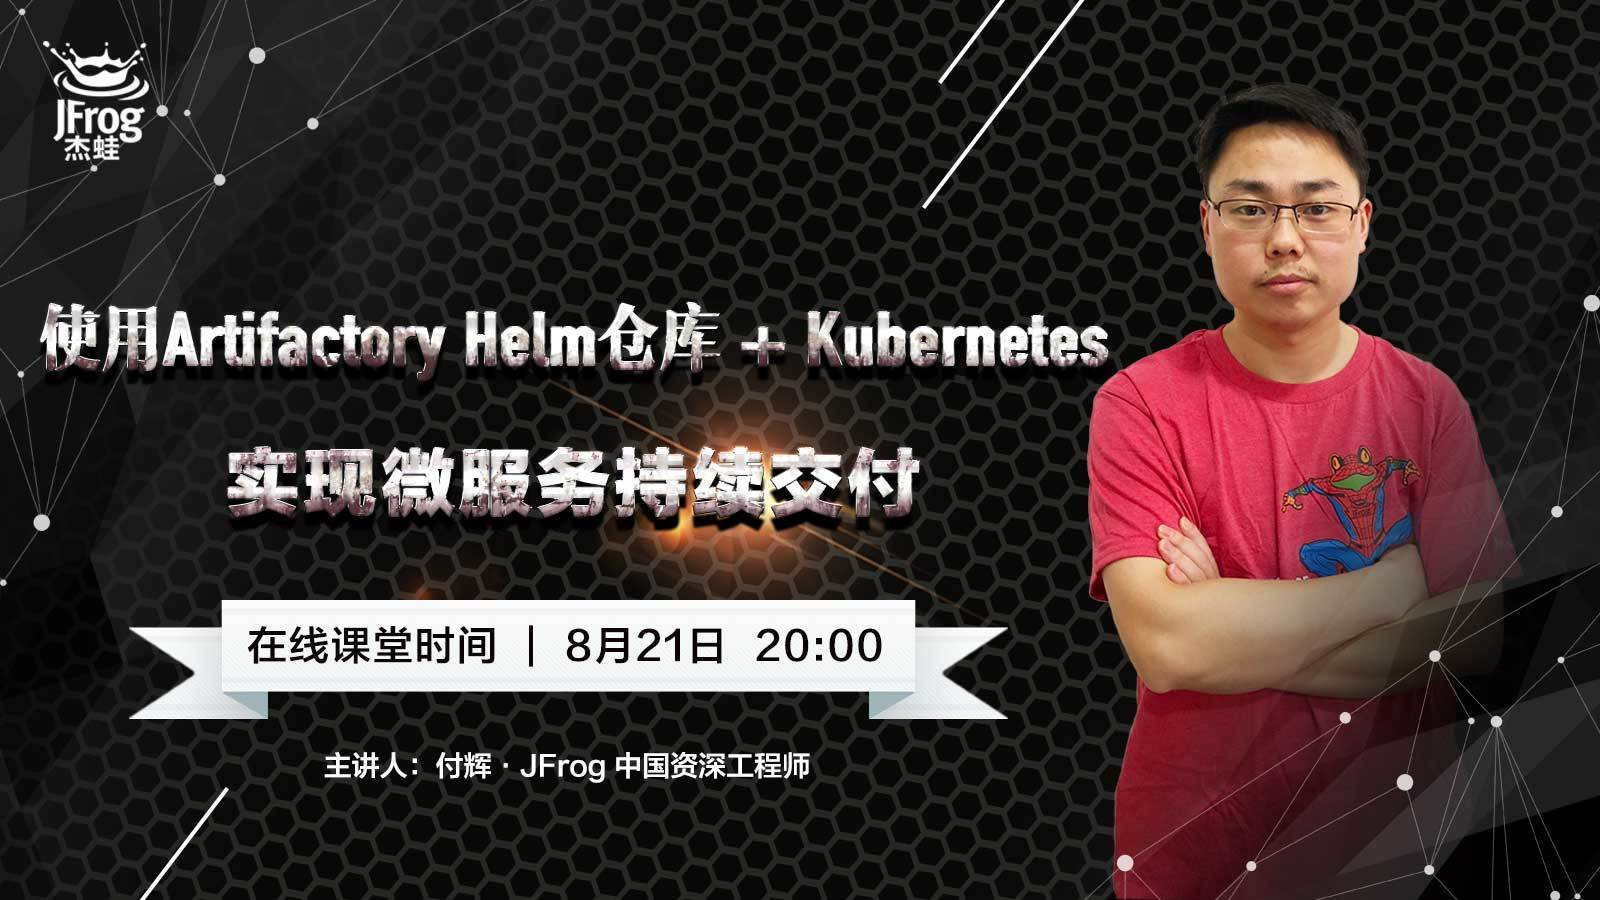 使用 Artifactory Helm 仓库 + Kubernetes 实现微服务持续交付